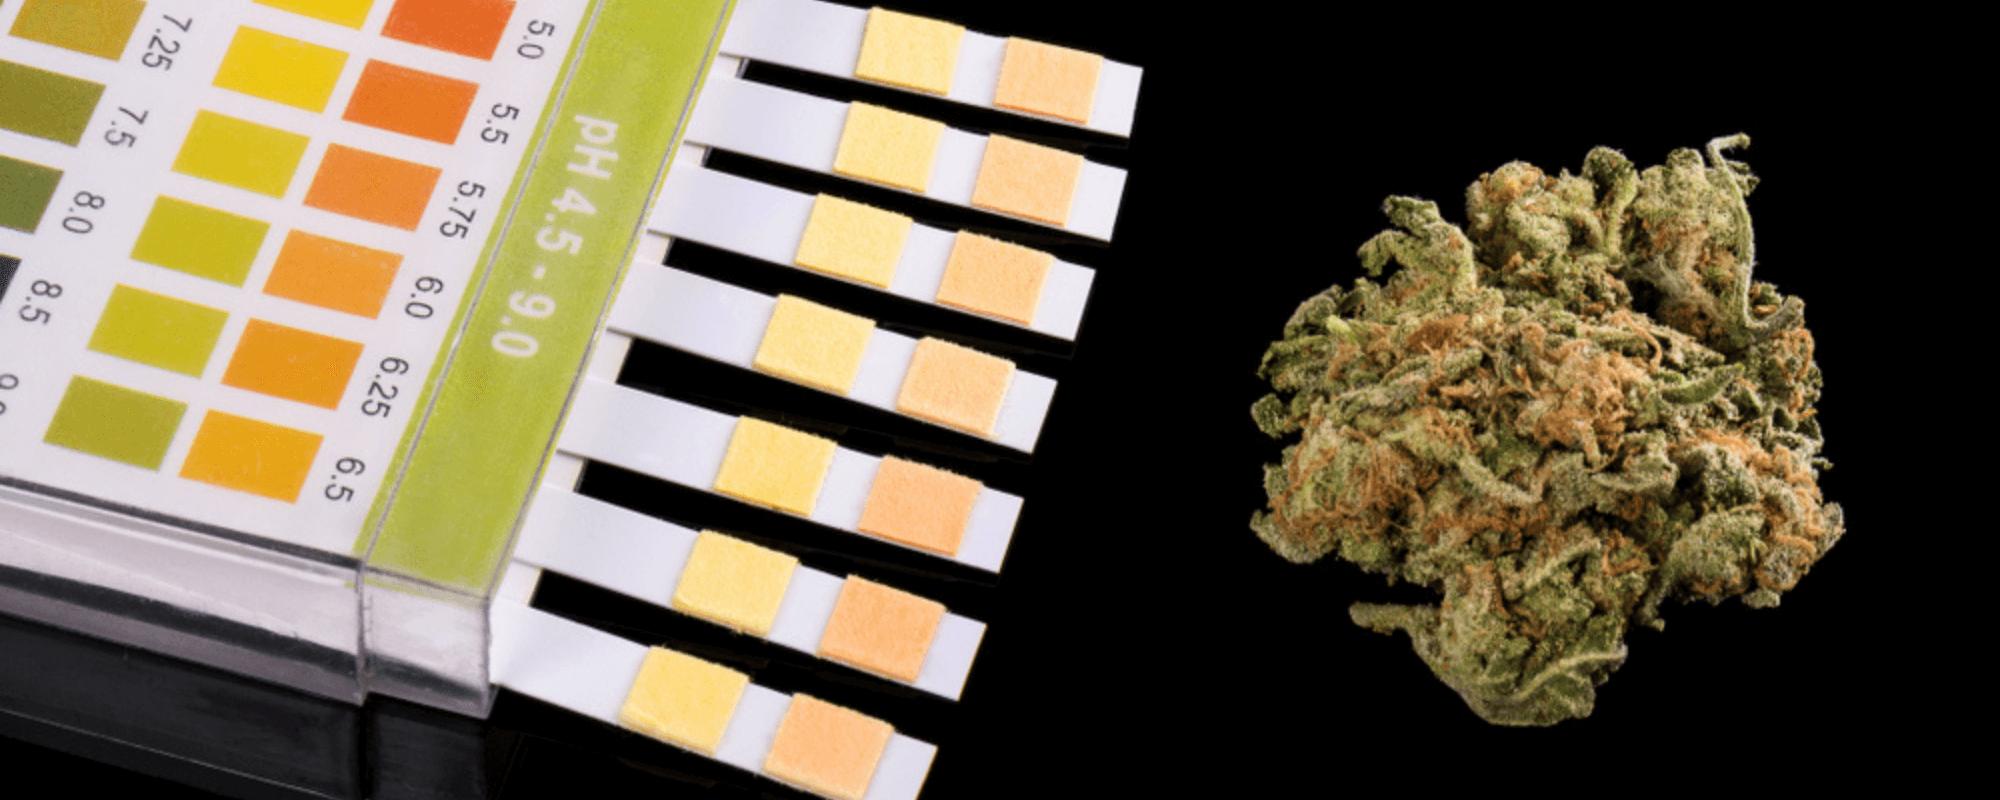 drug testing for cannabis